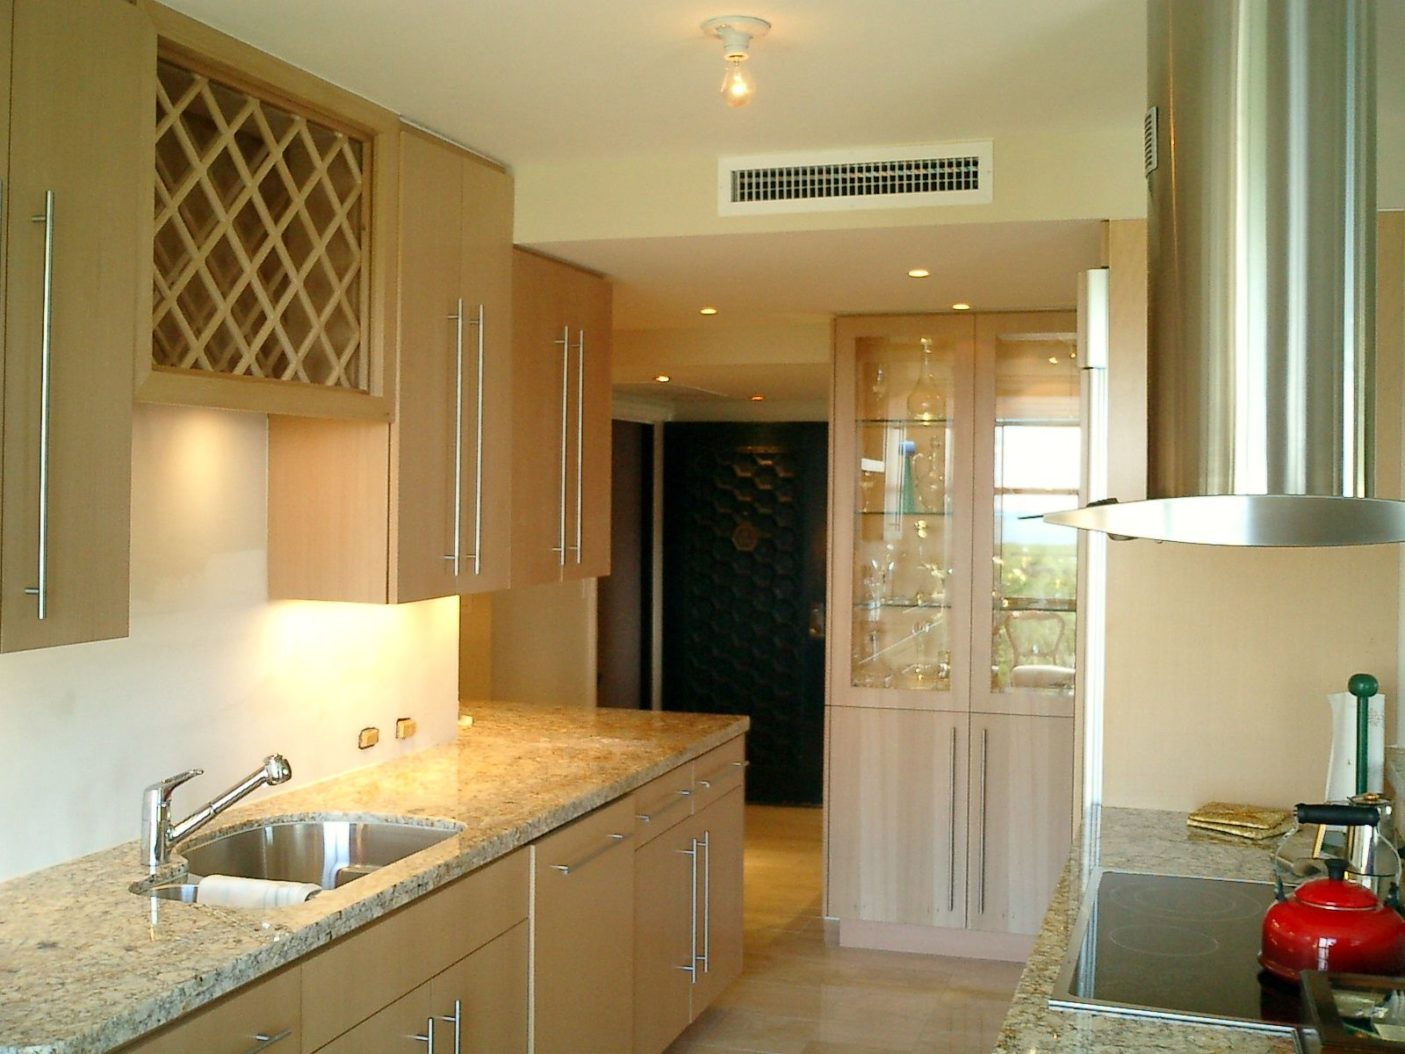 Kitchens-106.jpg